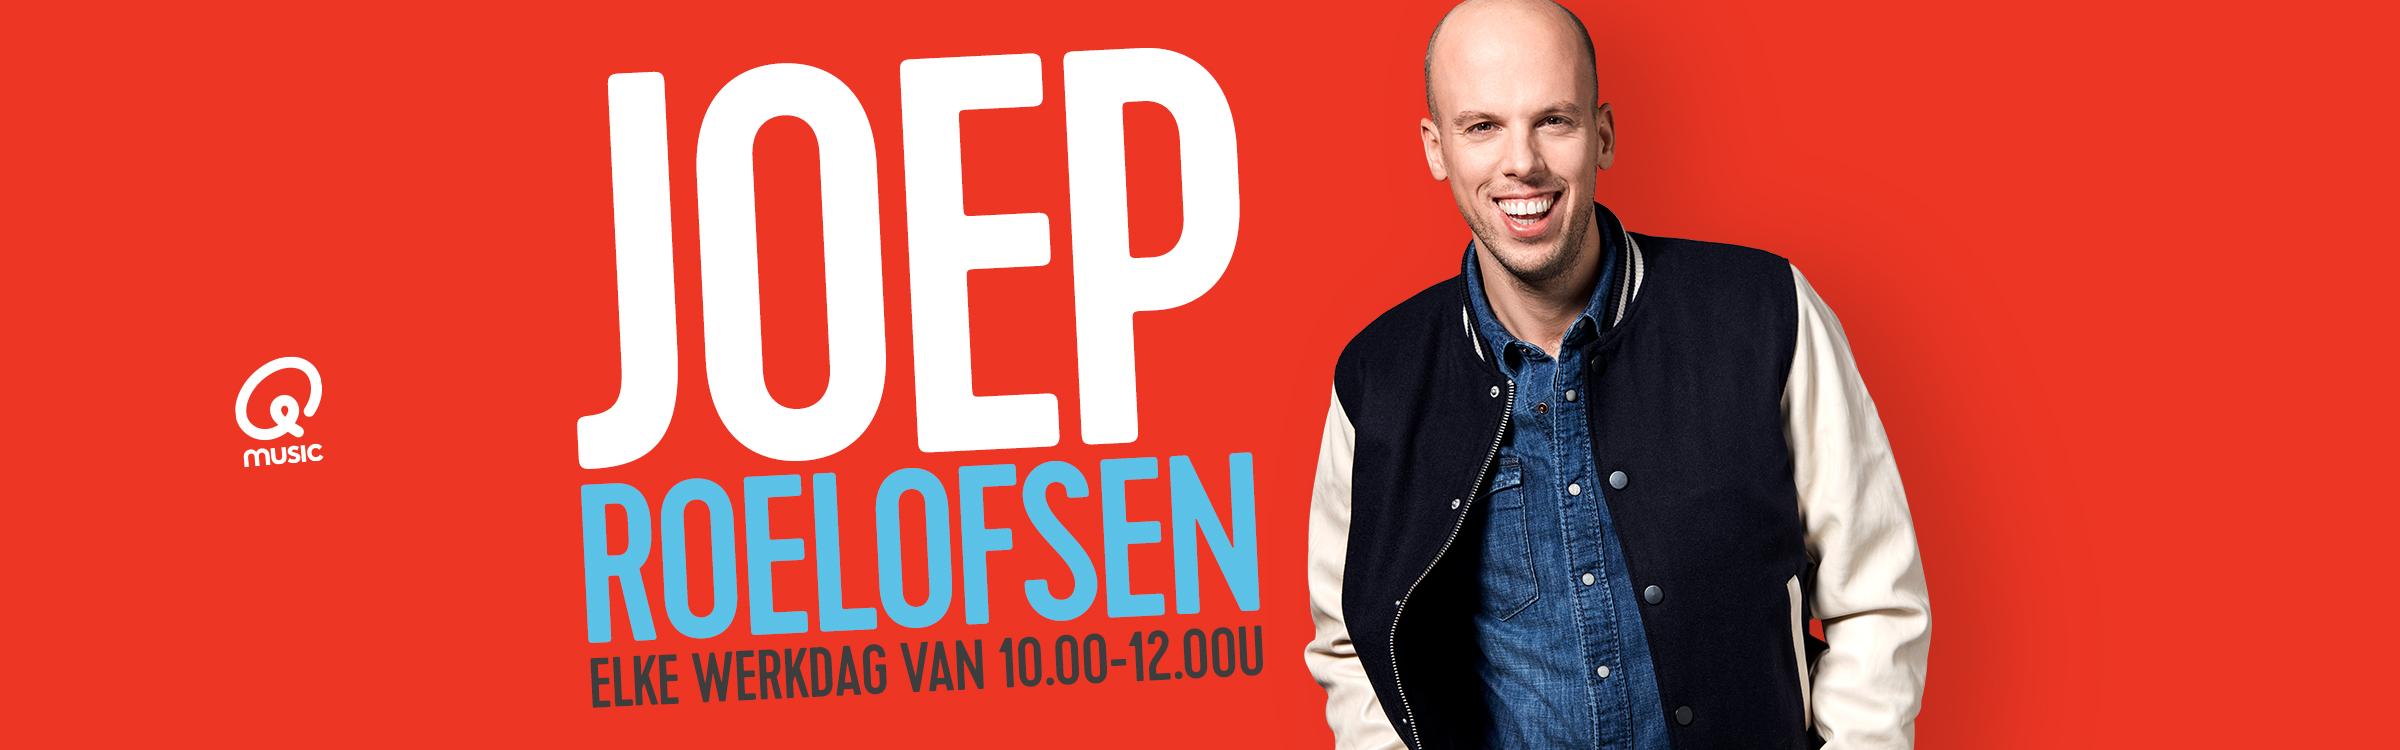 Joep Roelofsen